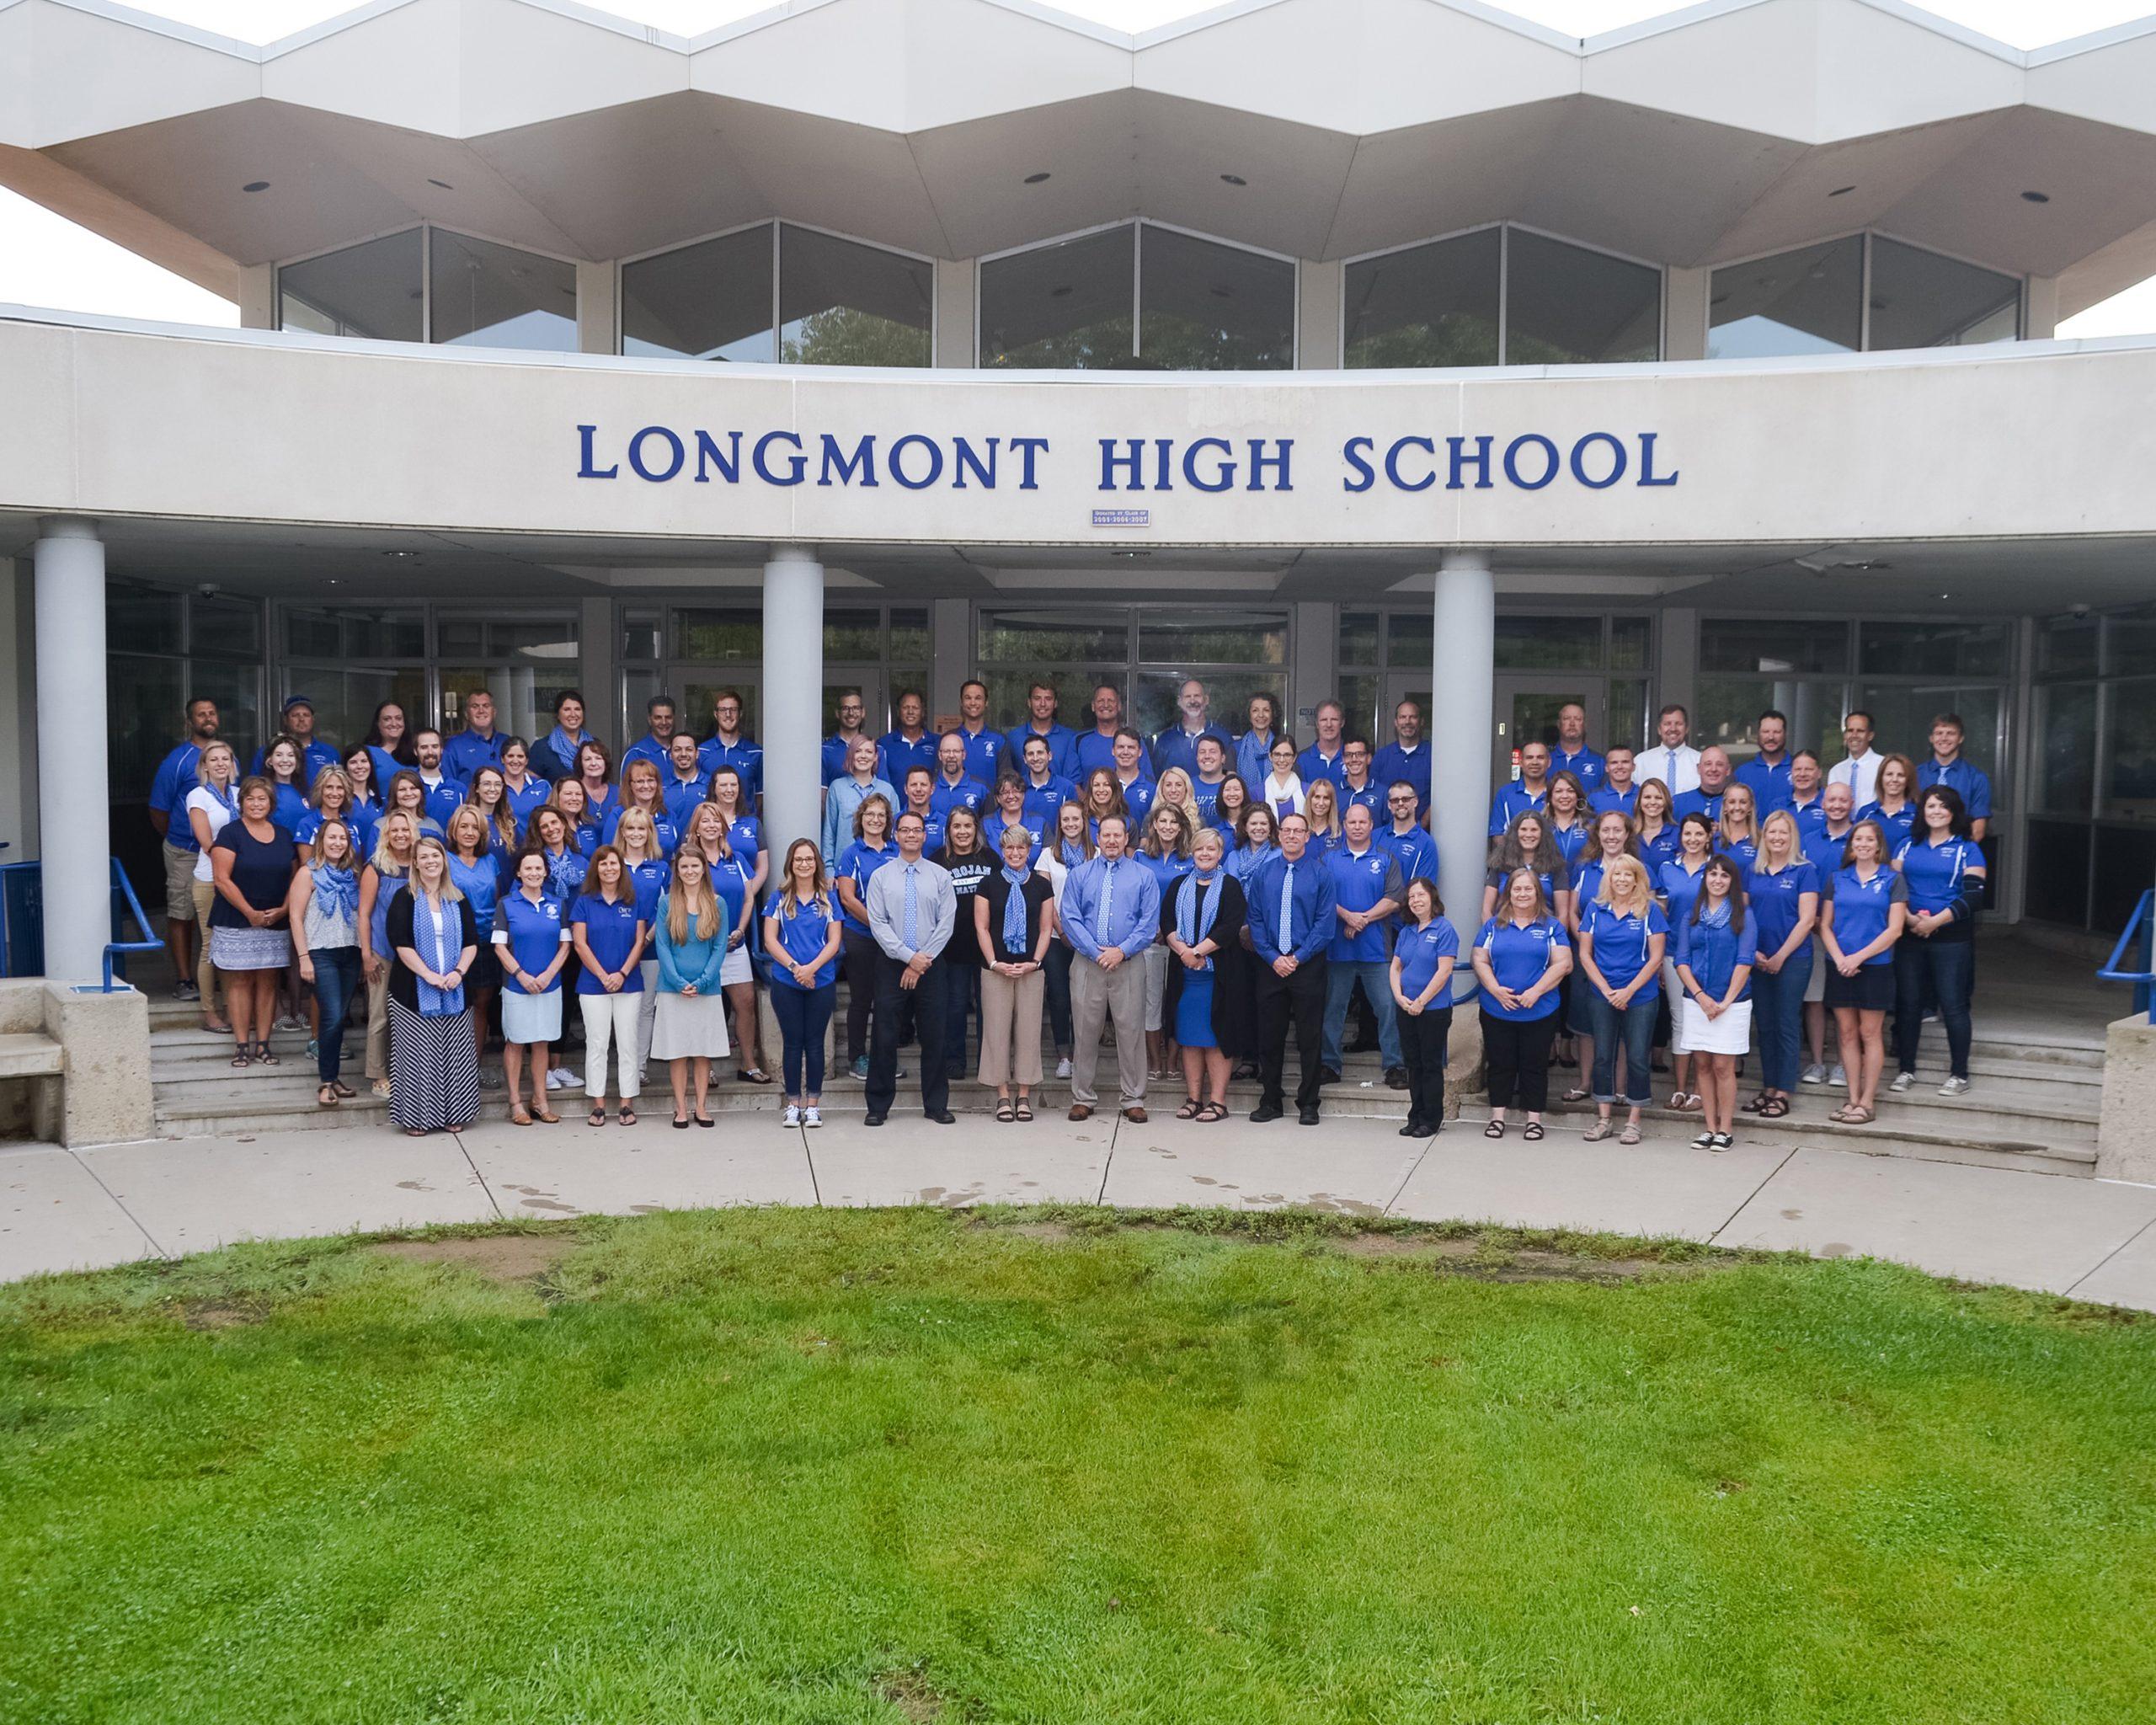 Longmont High School Staff